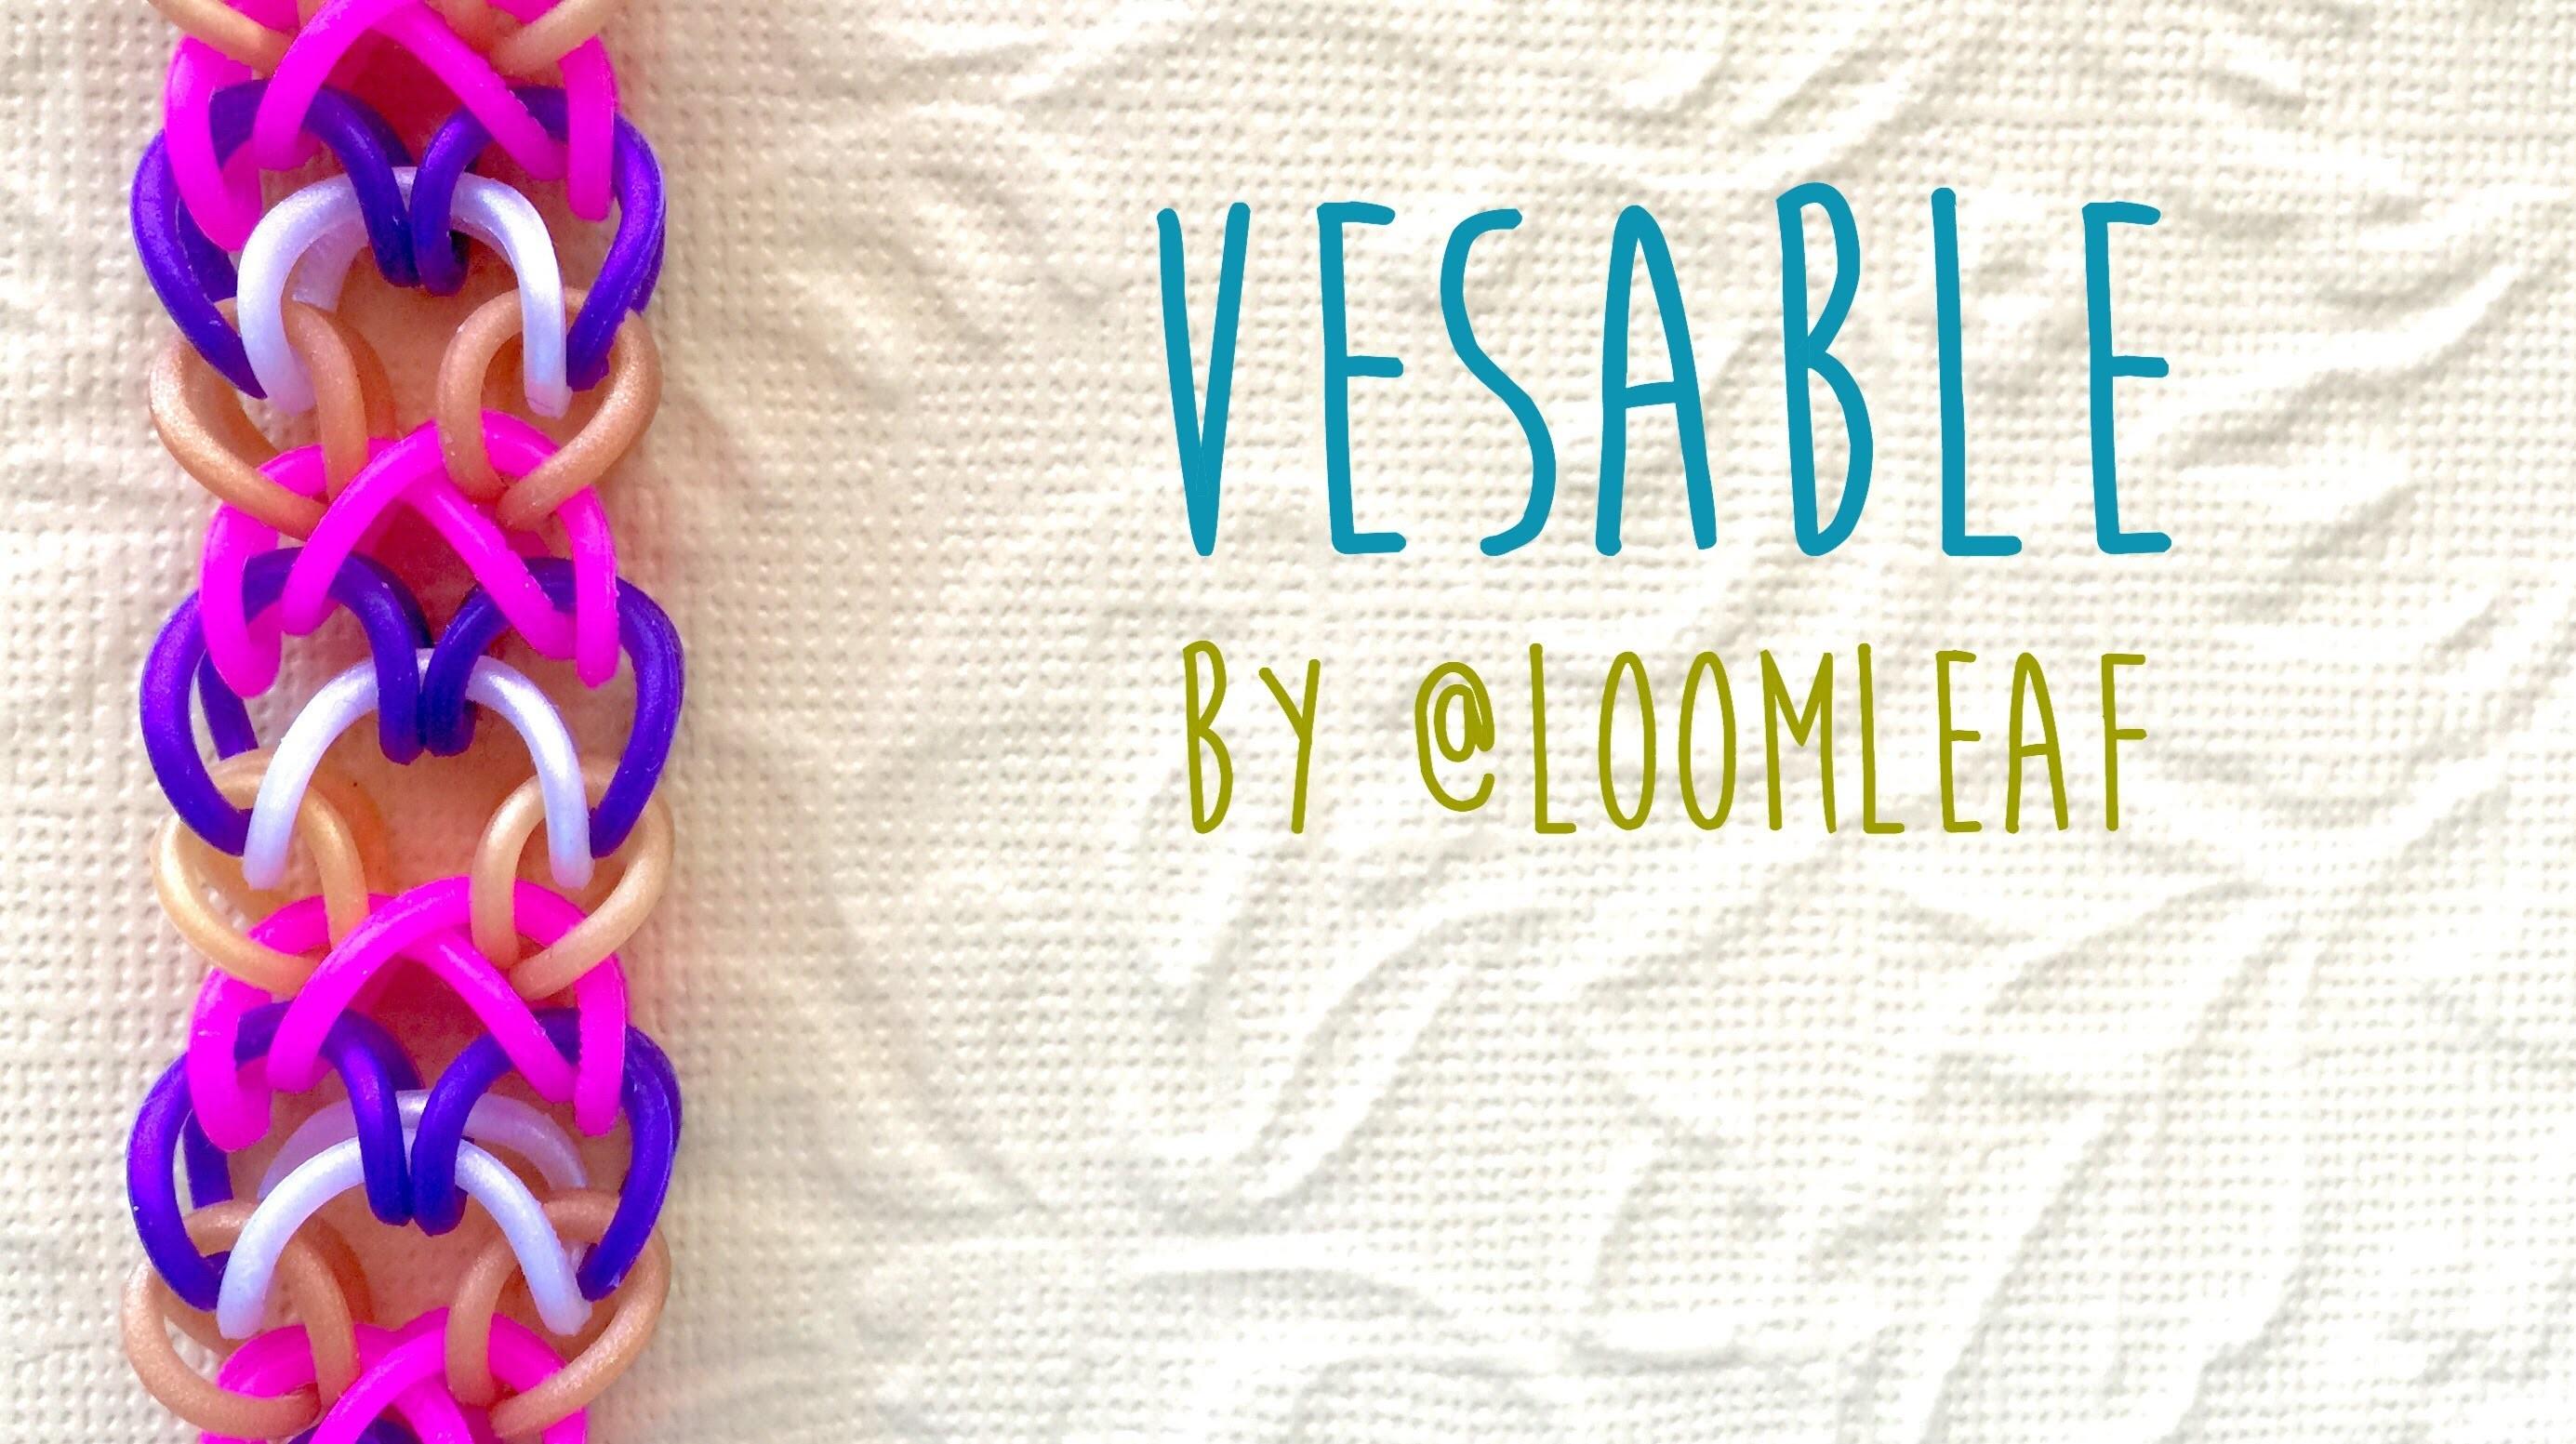 Rainbow Loom Bands Vesable by @LoomLeaf tutorial